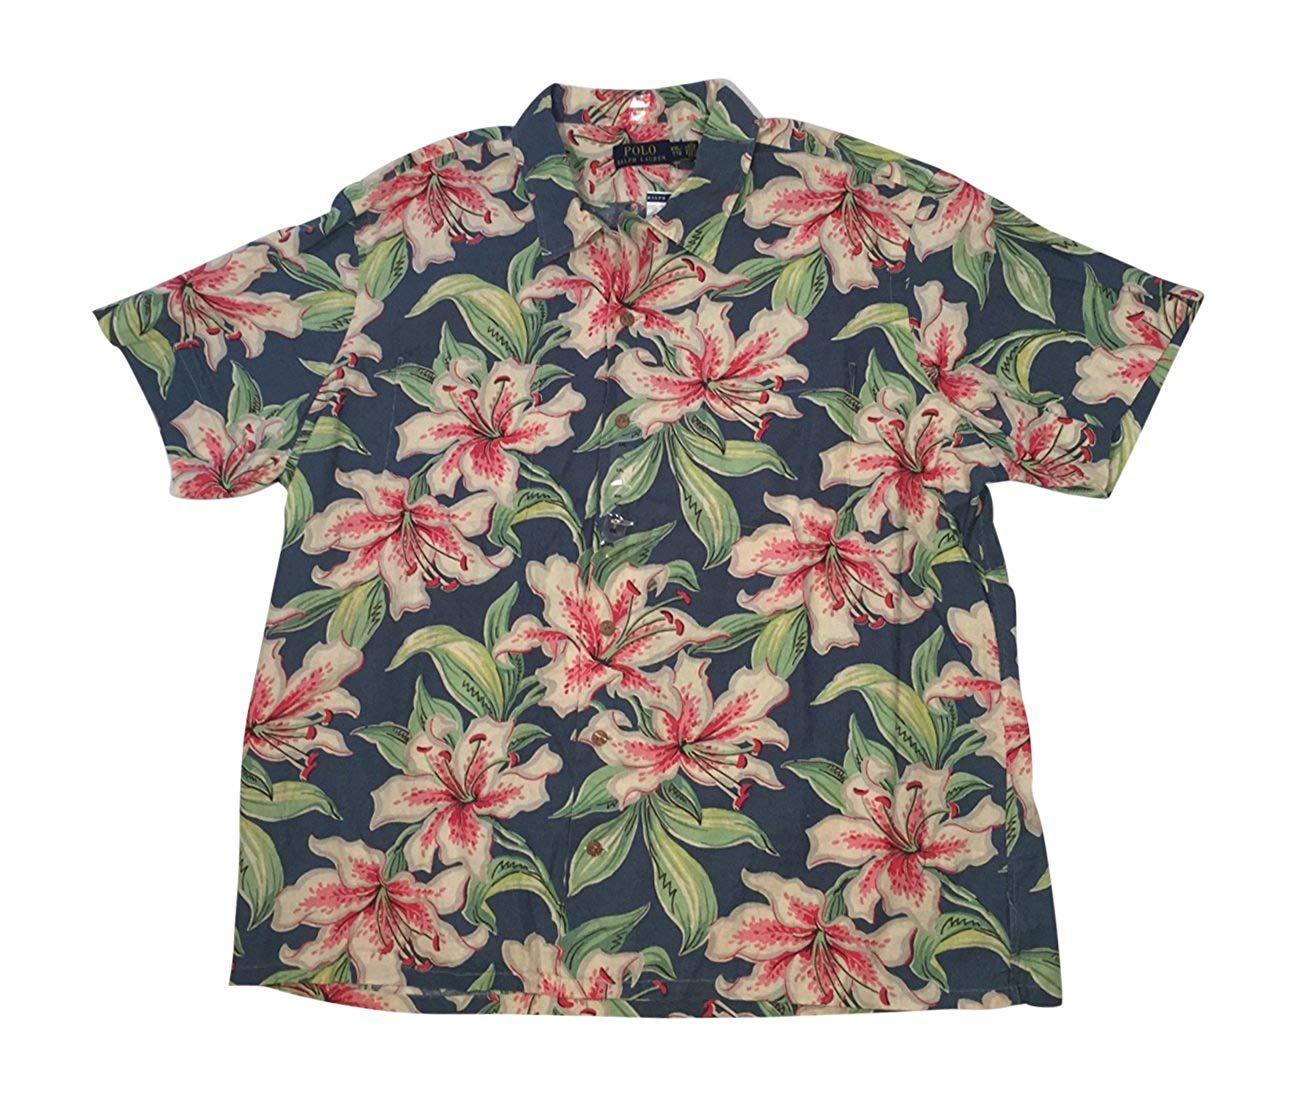 HANA+DORA Mens Casual Chest Pocket Short Sleeve Stripe Button Down Shirts